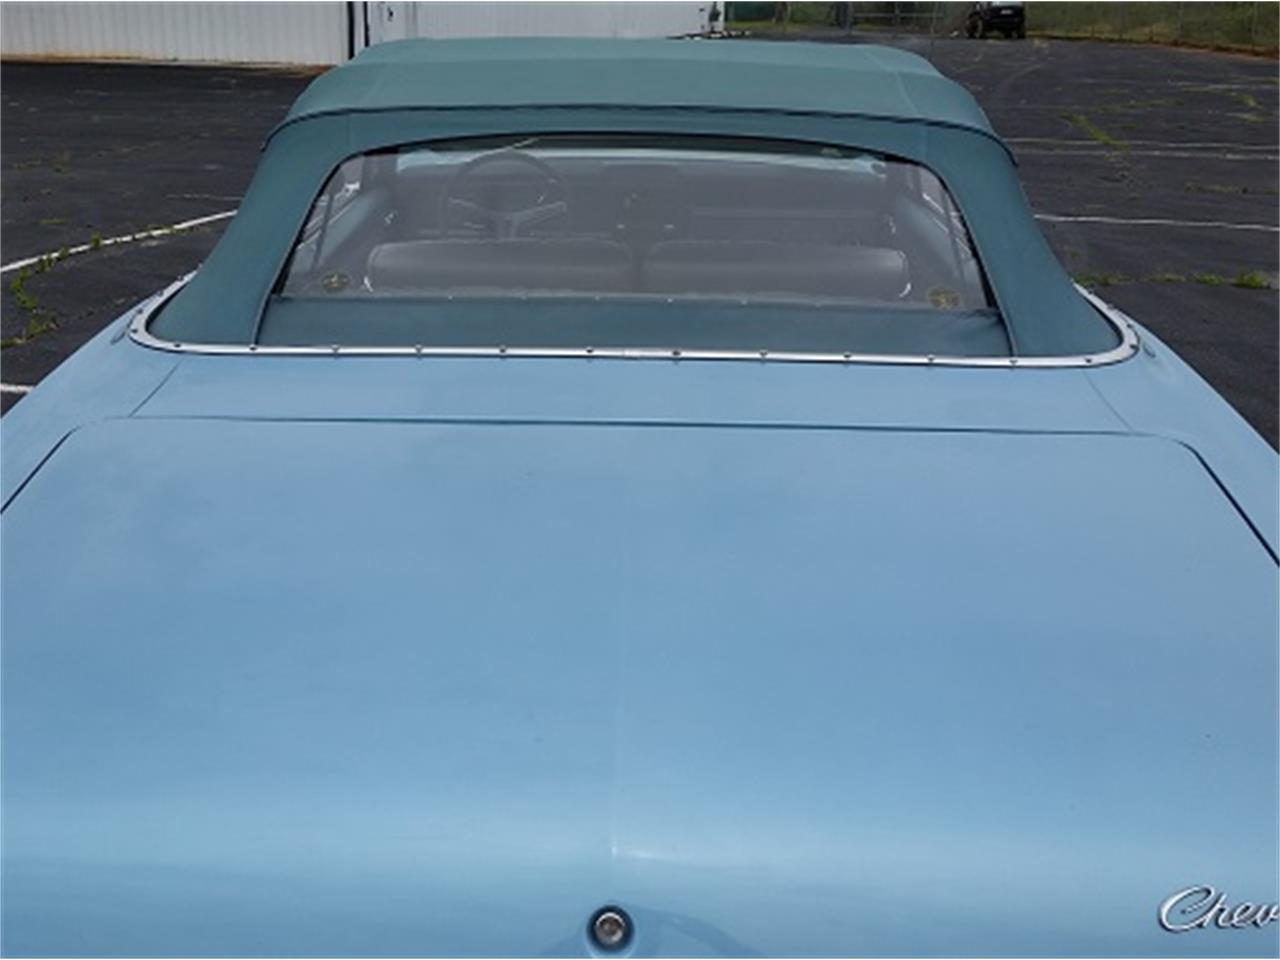 Large Picture of Classic '68 Chevrolet Impala located in South Carolina - KUCU